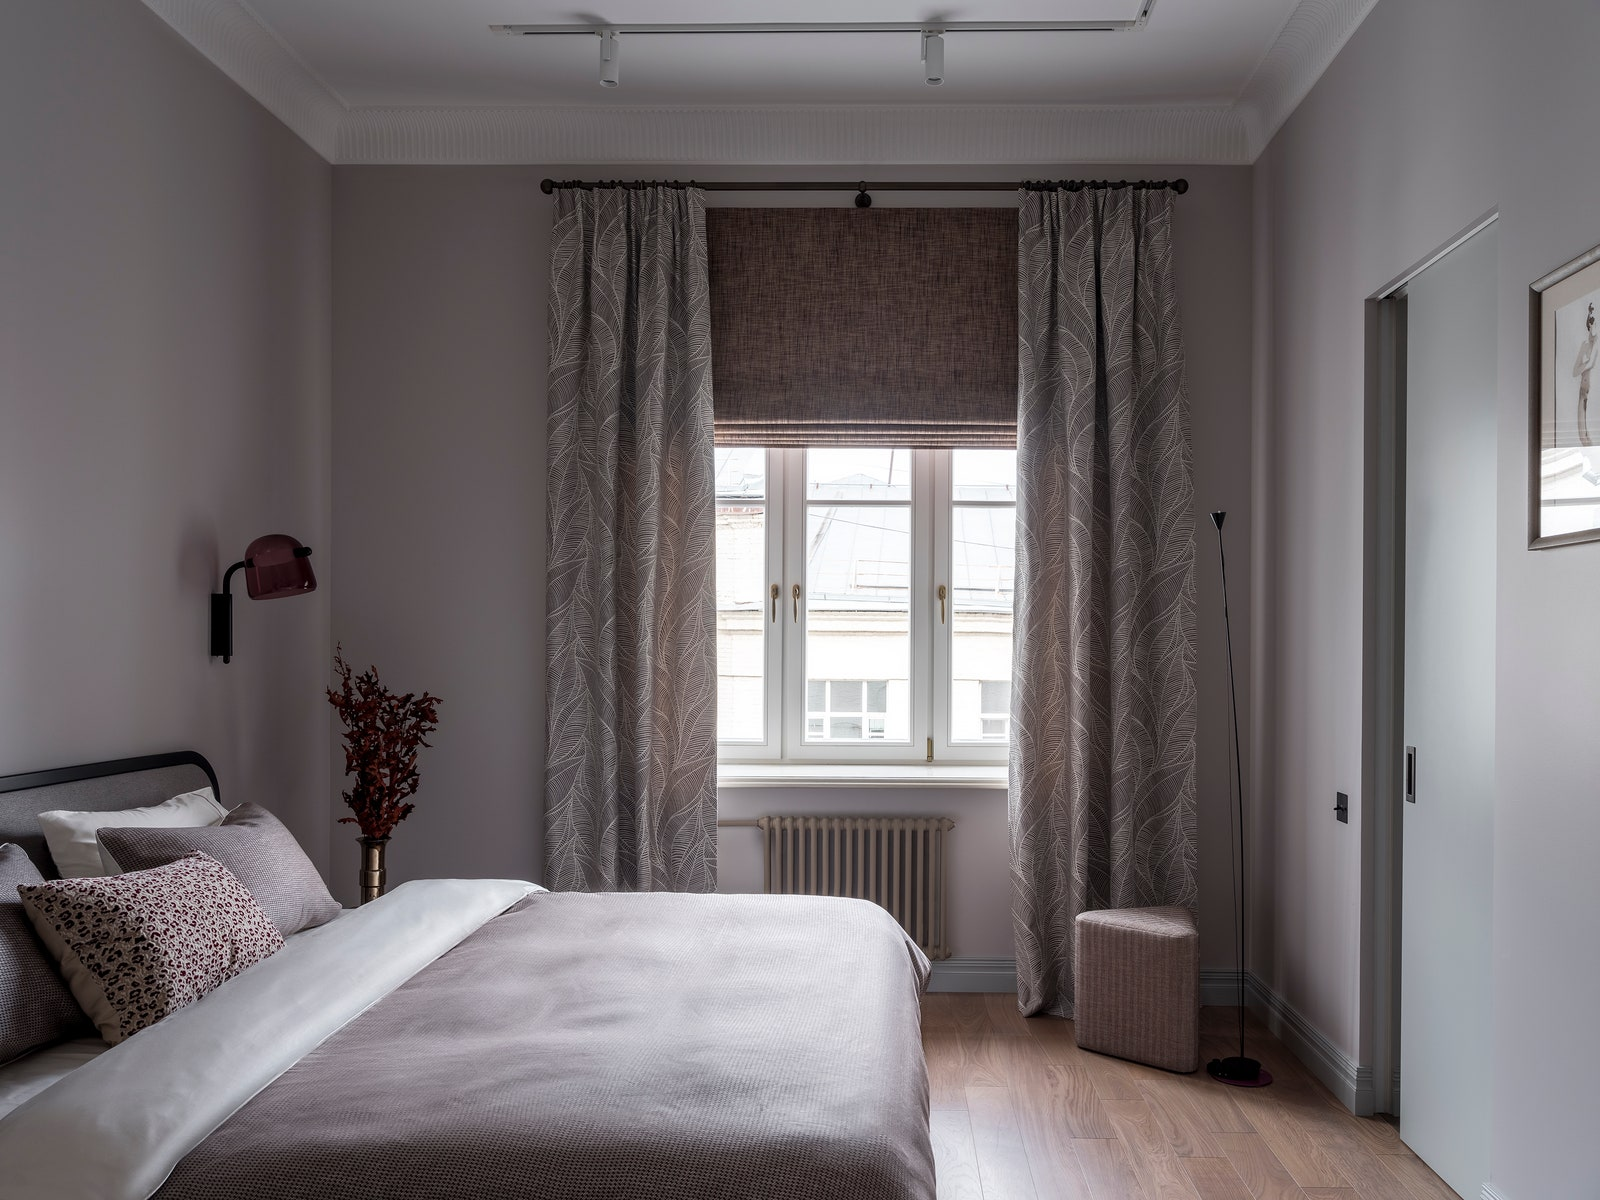 .  Pianca  Brokis  ADecor  Loffilab   Amalia Home Collection  Loffilab.